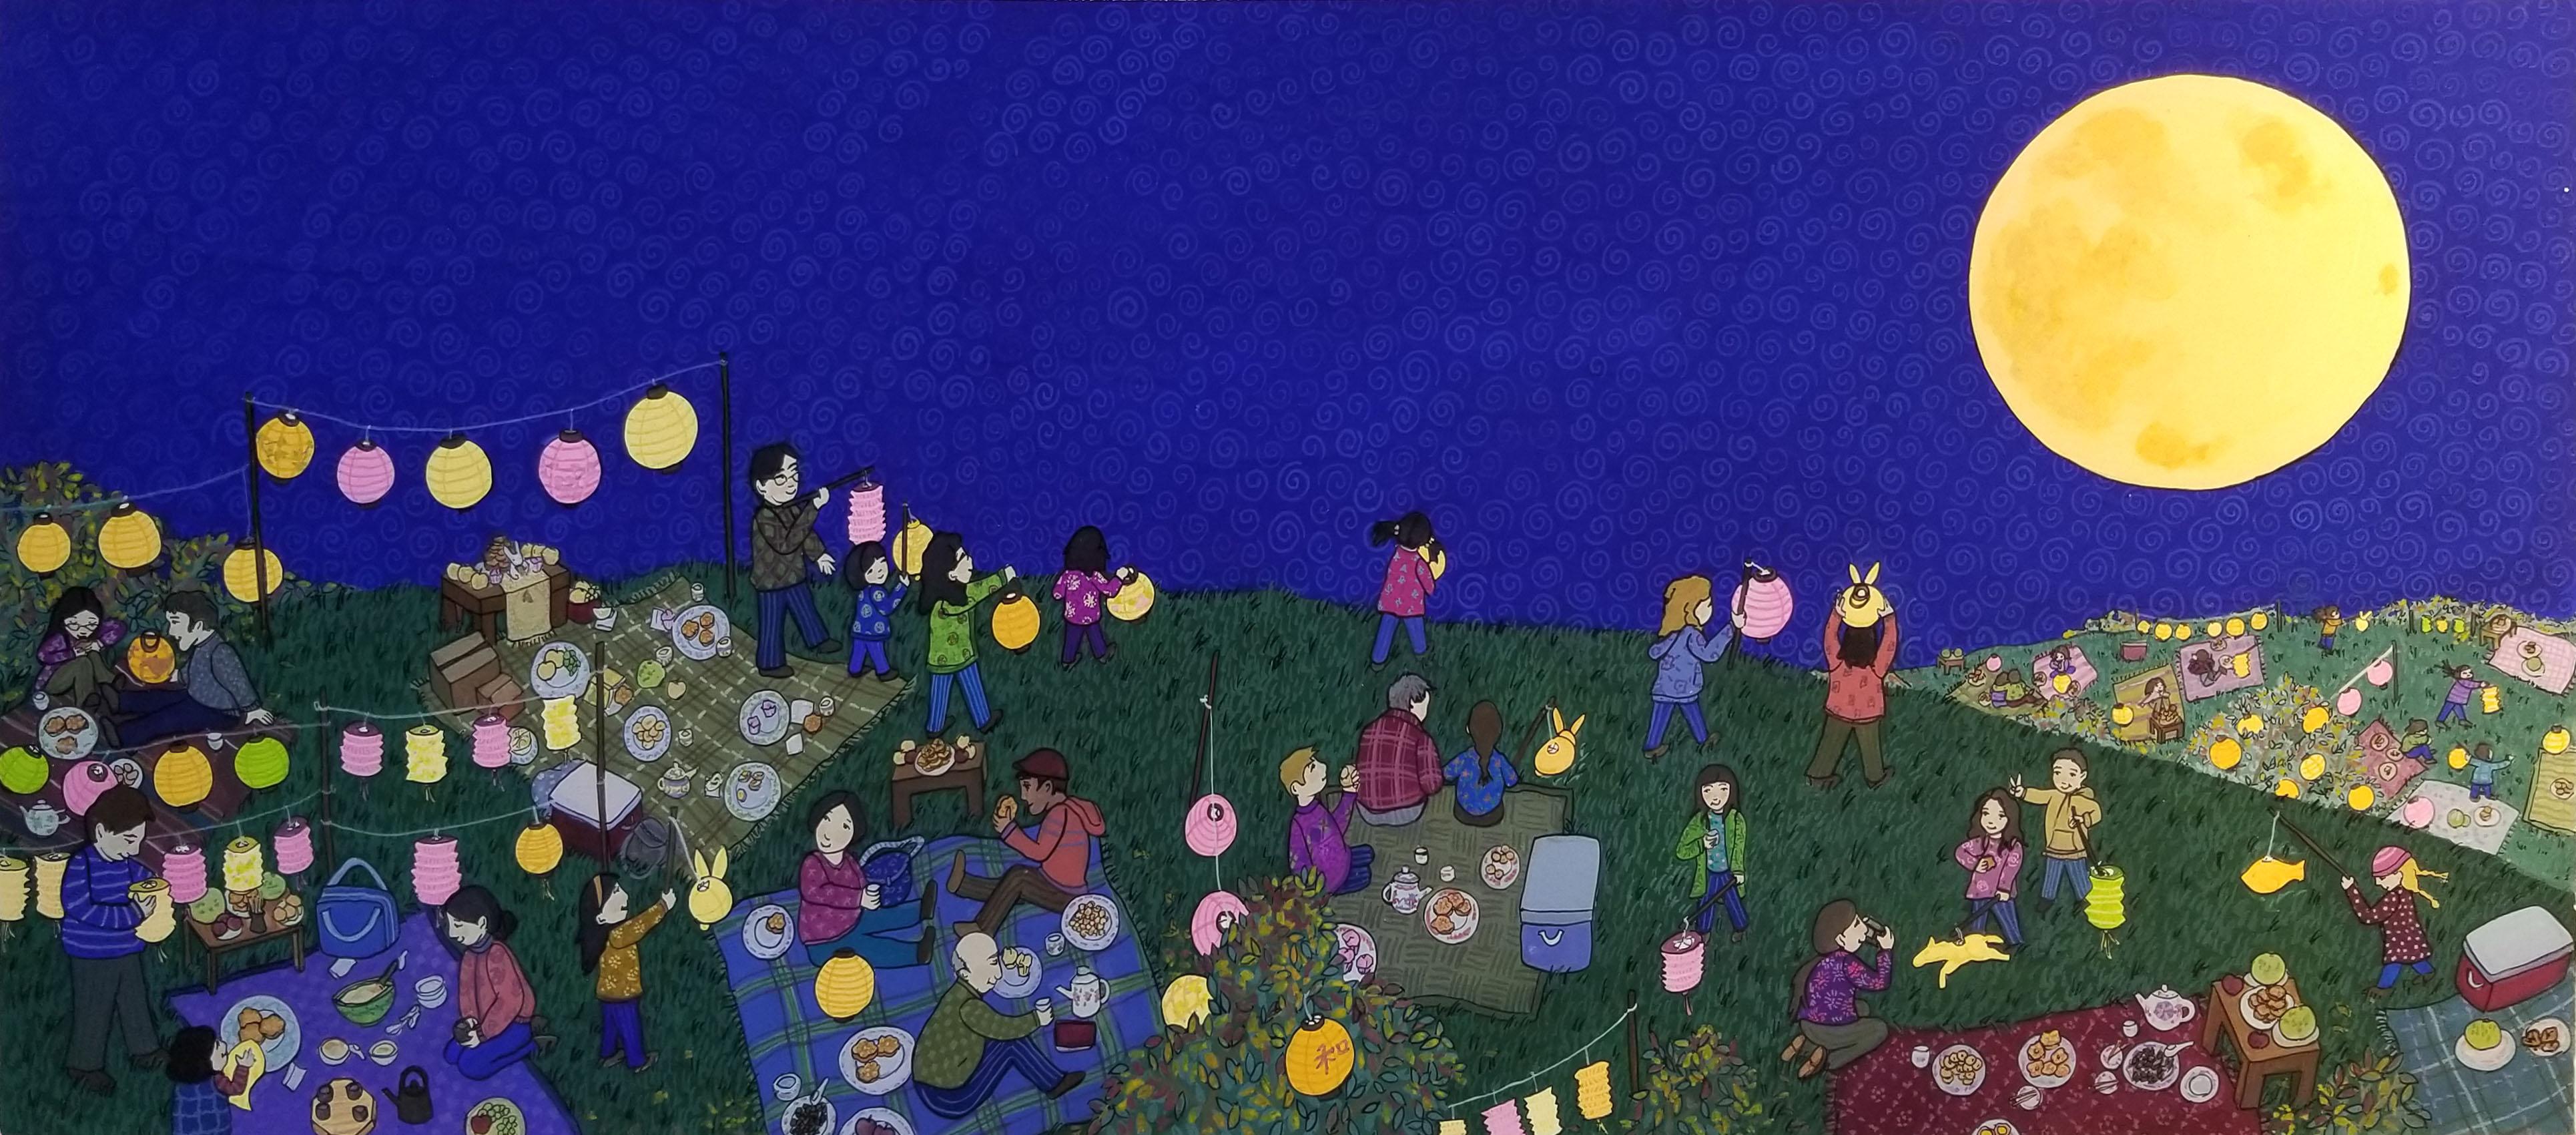 TTM-Mid-Autumn Moon Festival8.75×20.5